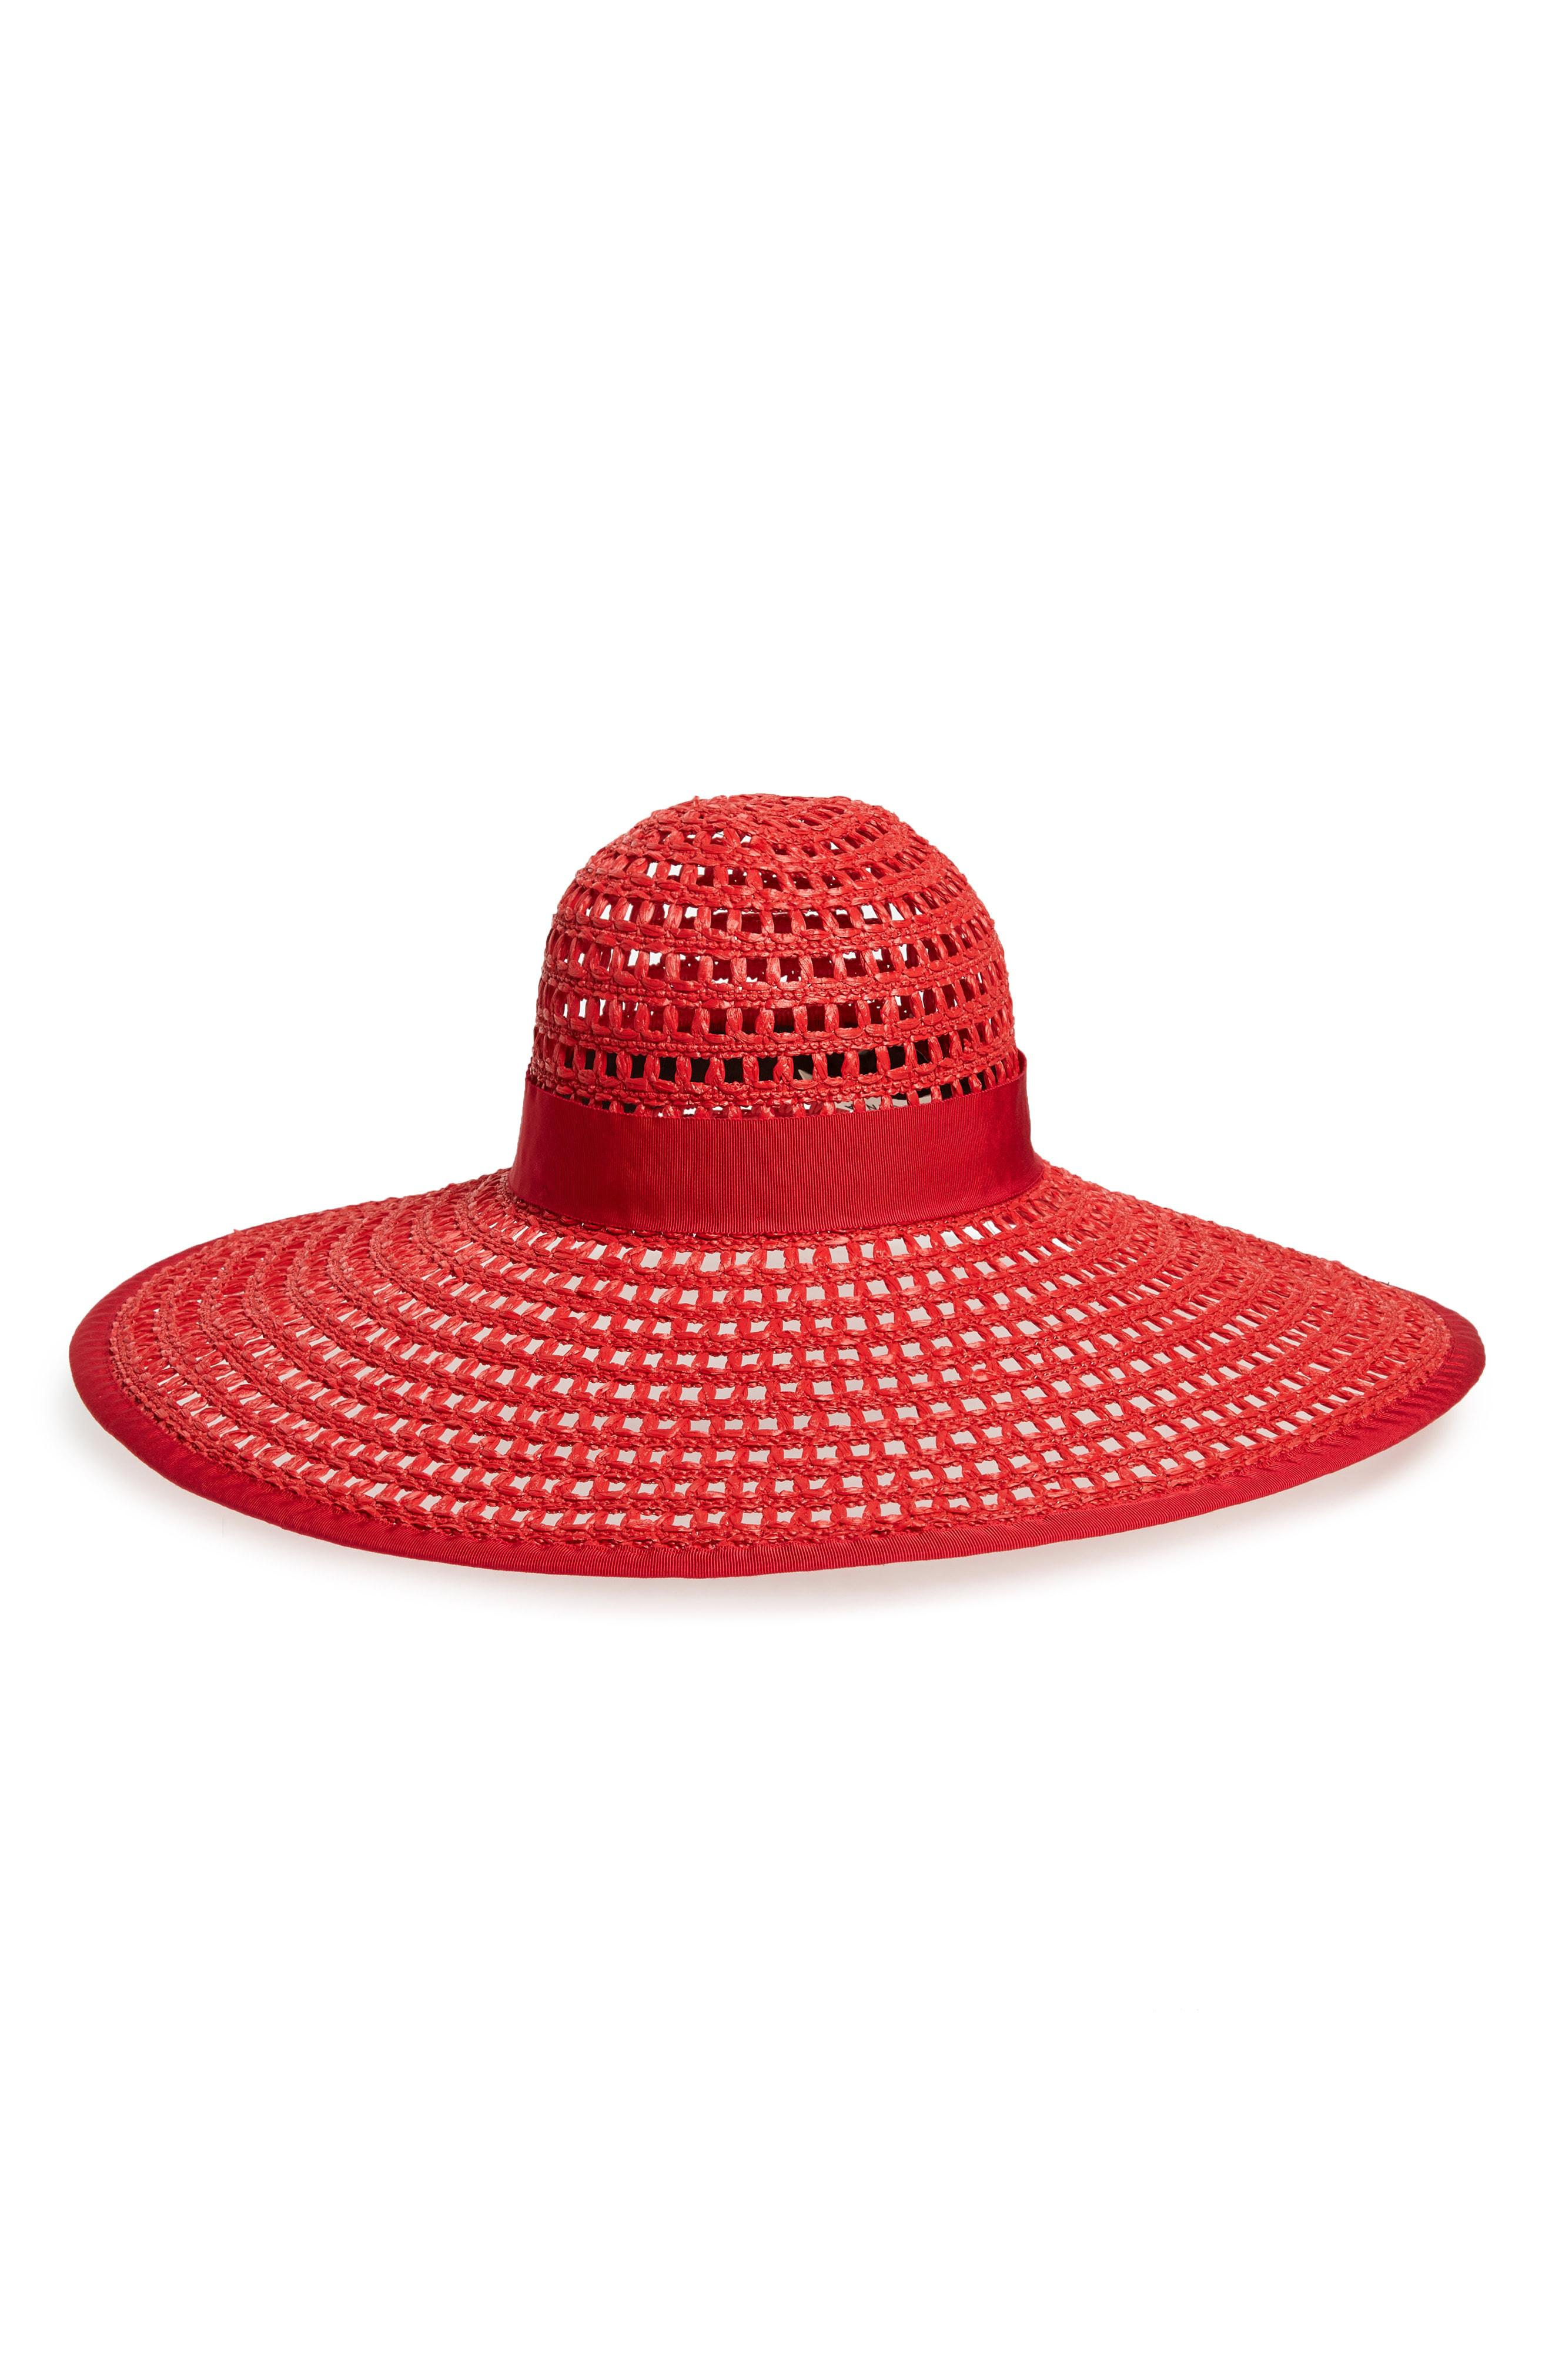 a88624a3 Eugenia Kim Sunny Woven Wide Brim Hat - Red | ModeSens